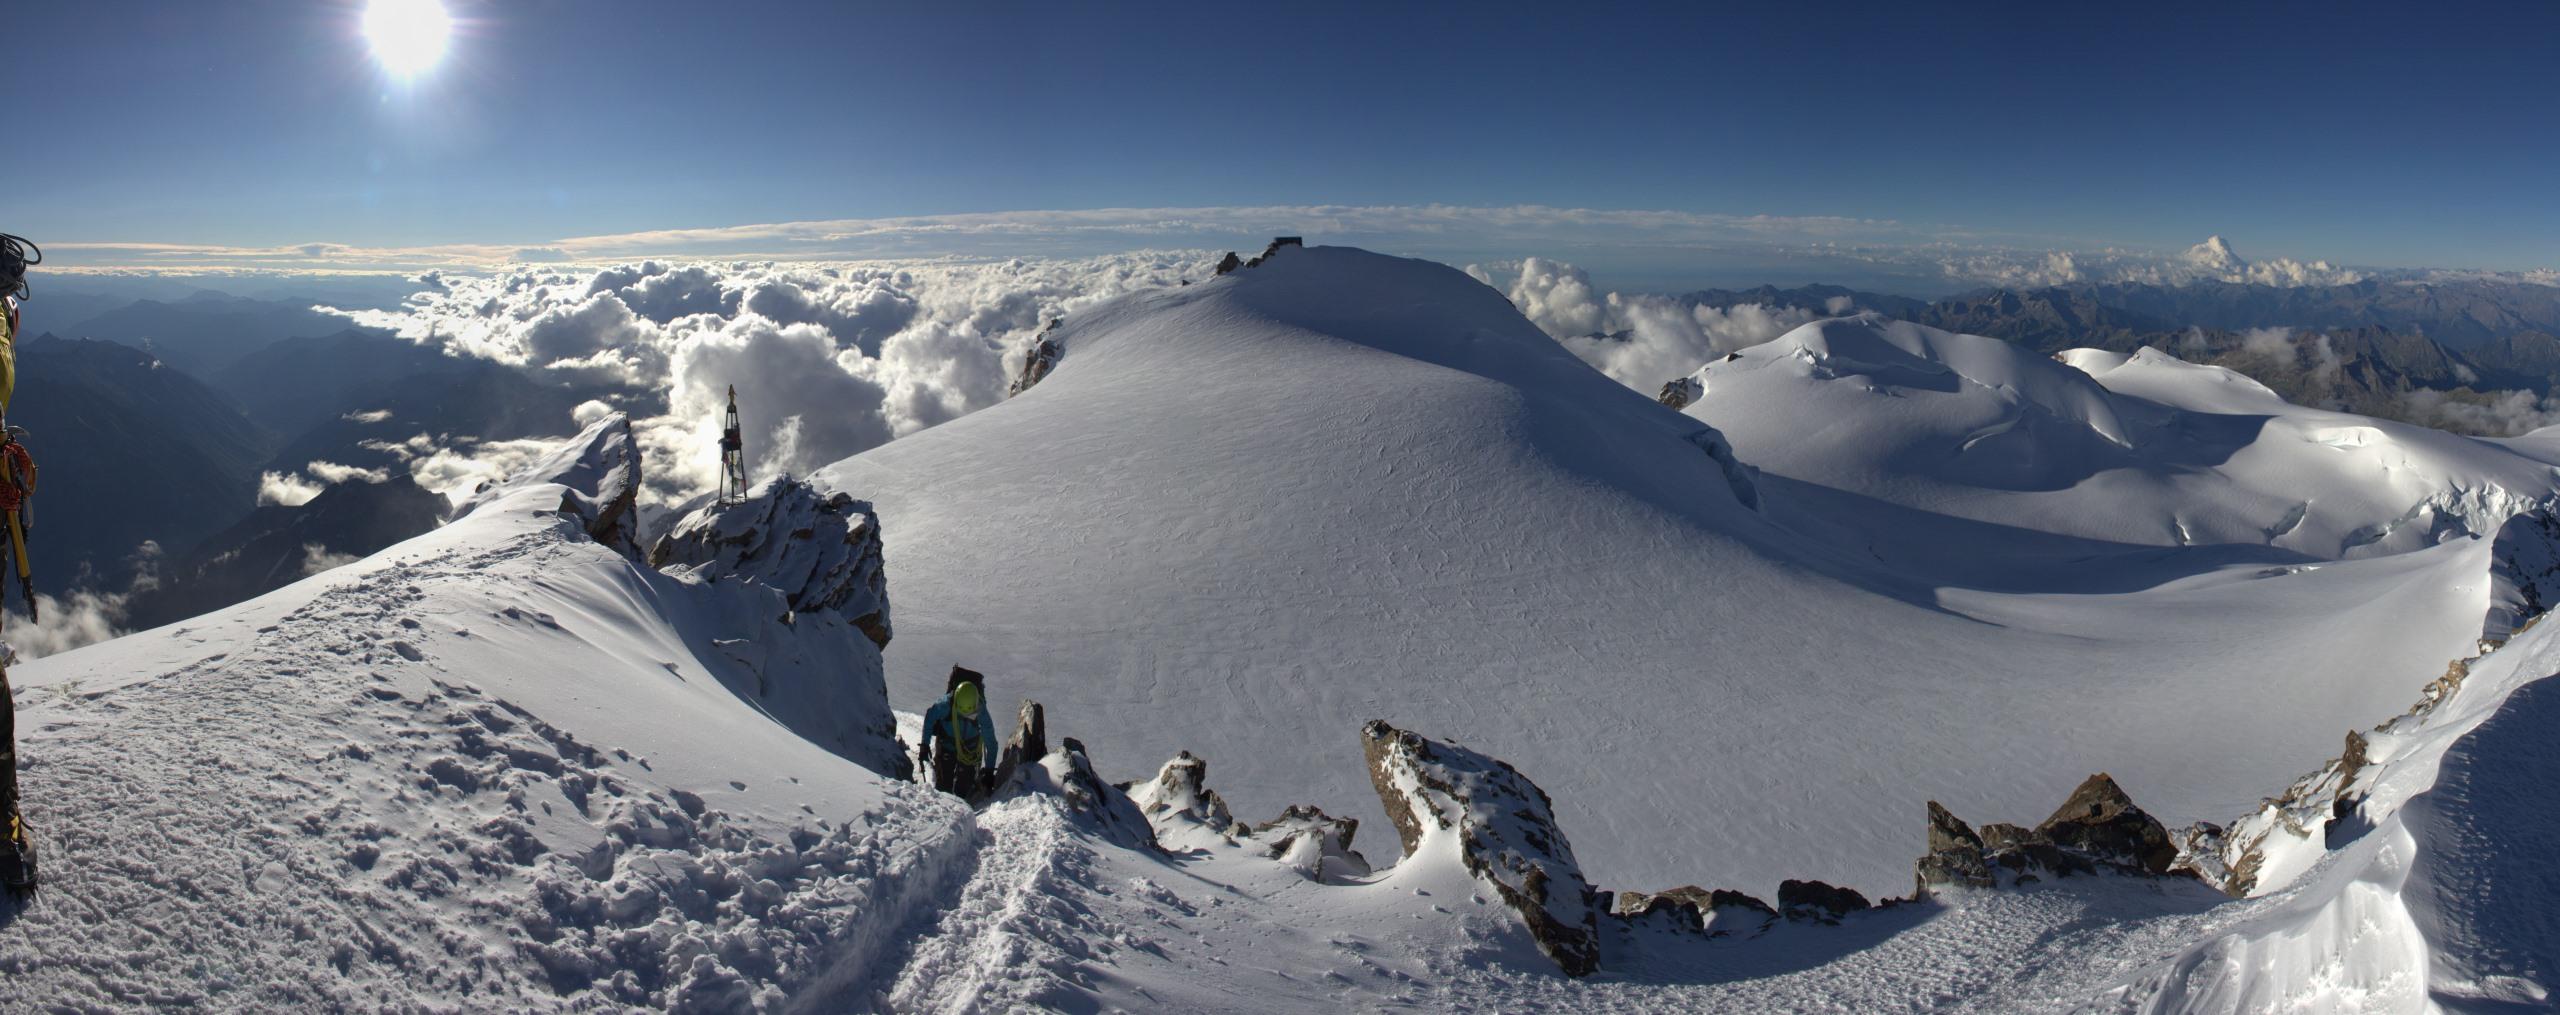 2016-zumsteinspitze